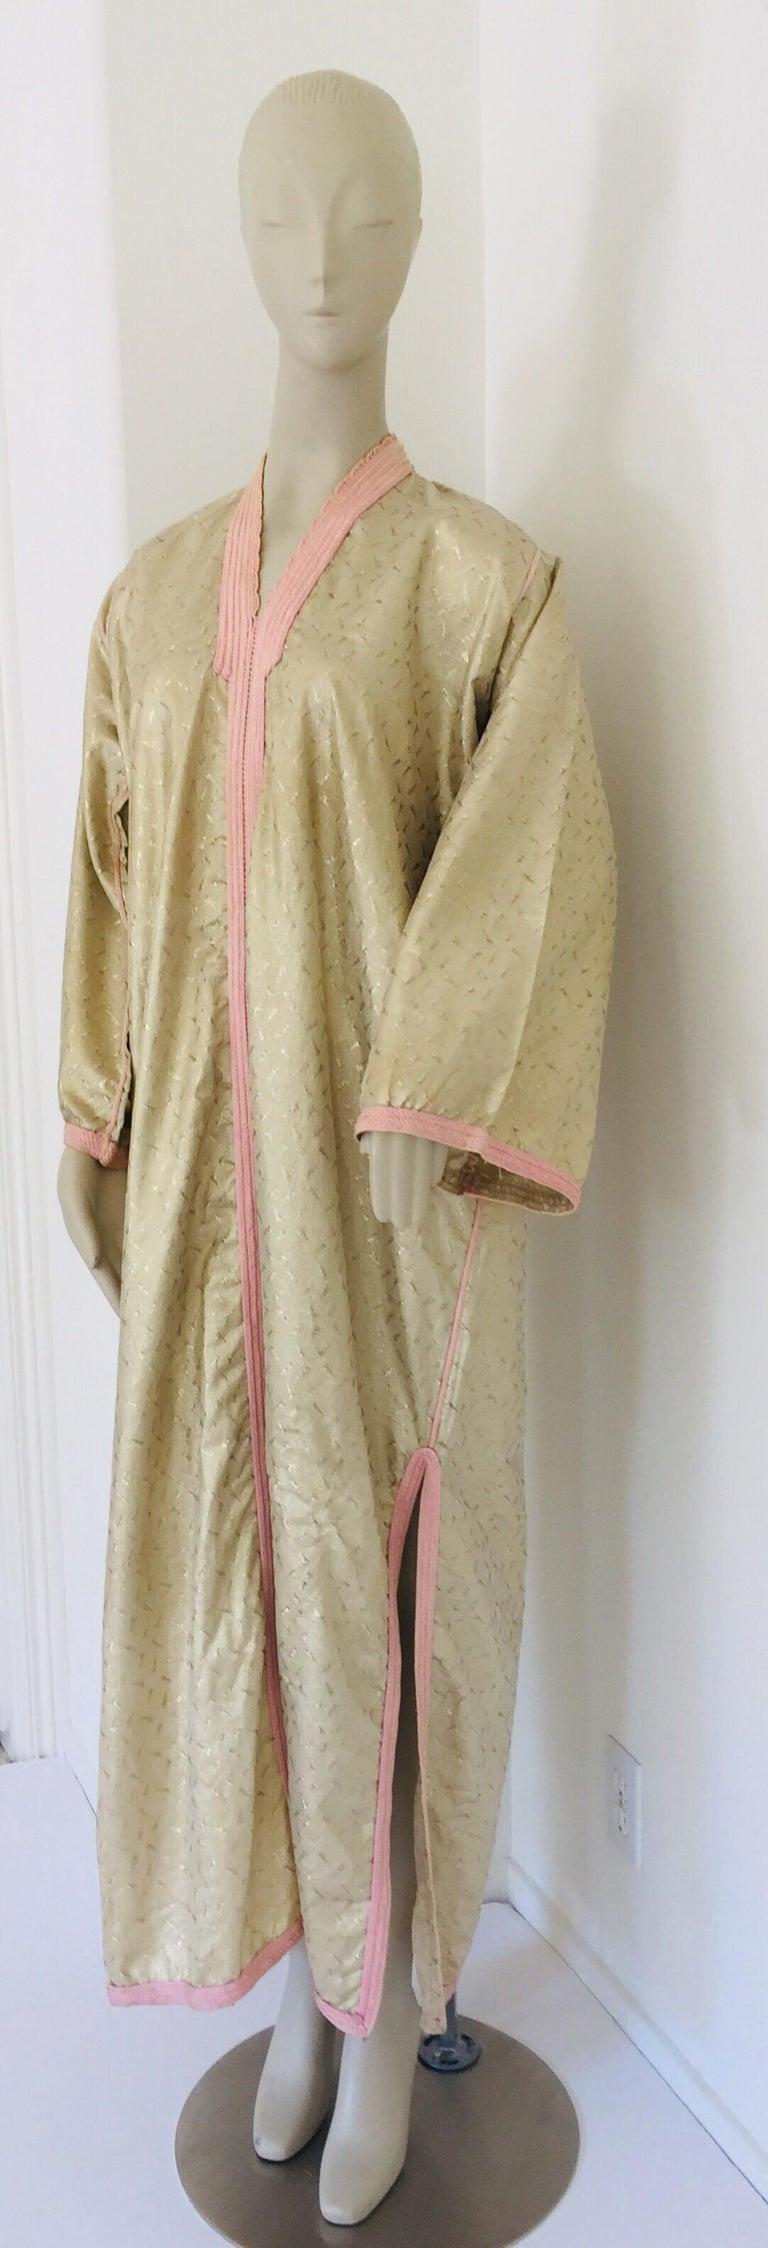 1970s Metallic Gold Moroccan Caftan, Kaftan Maxi Dress North Africa, Morocco For Sale 10